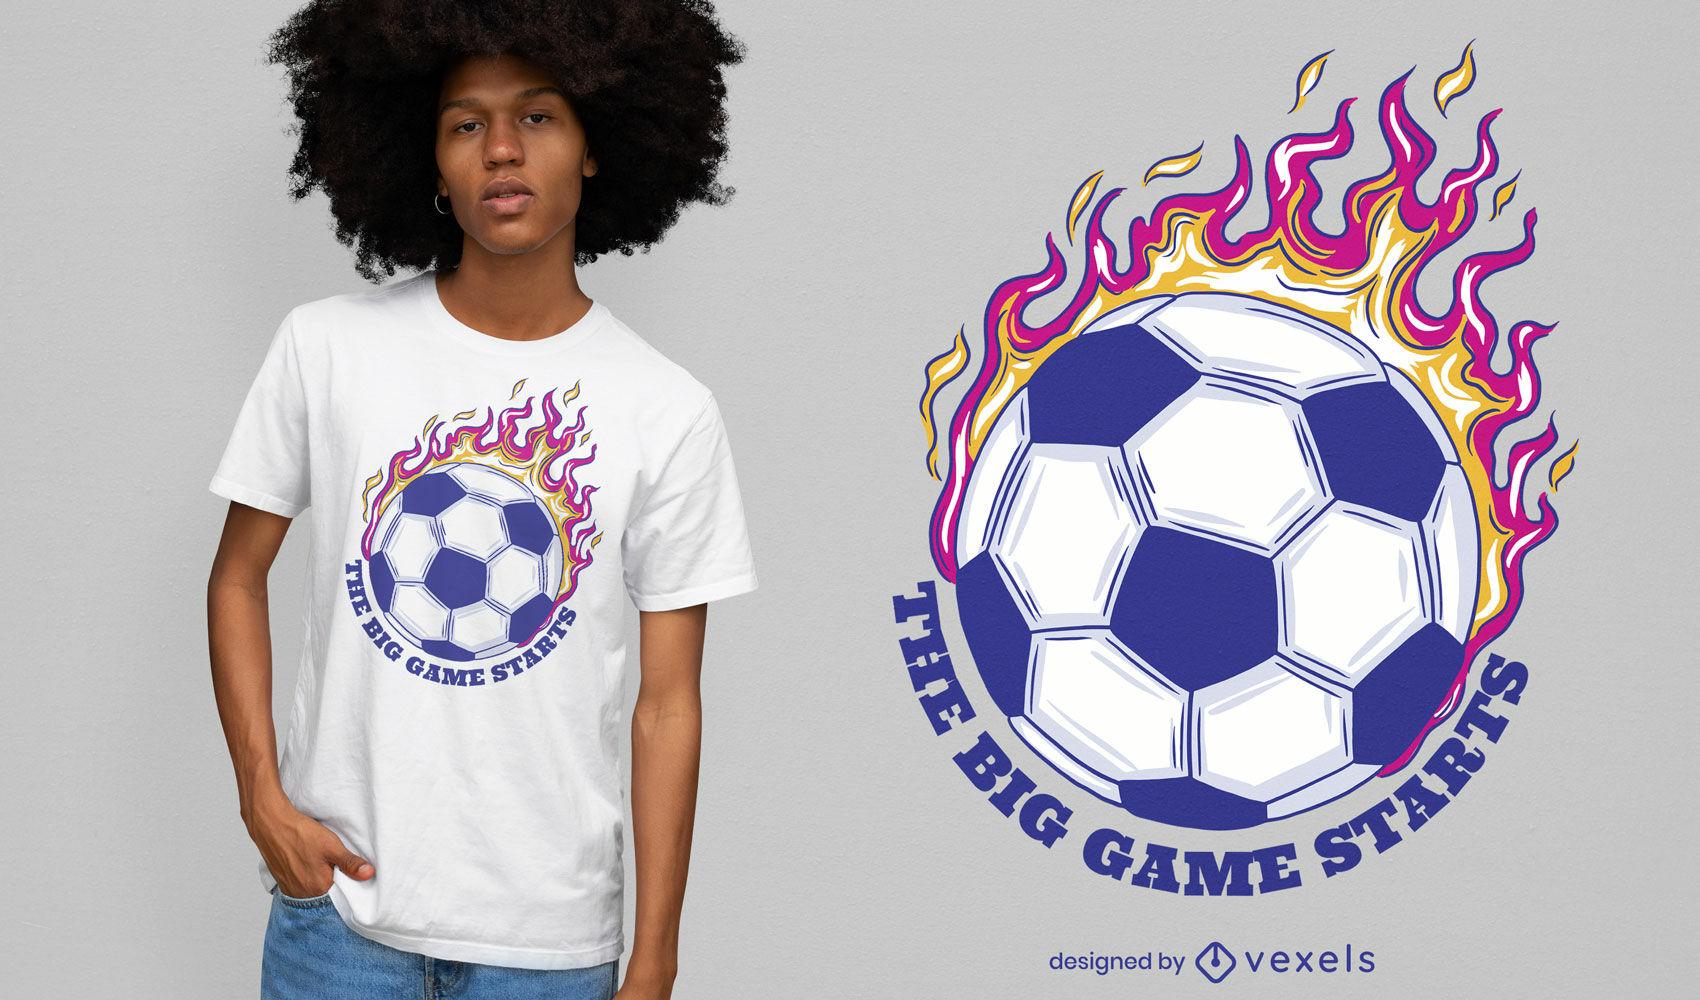 Cool soccer t-shirt design